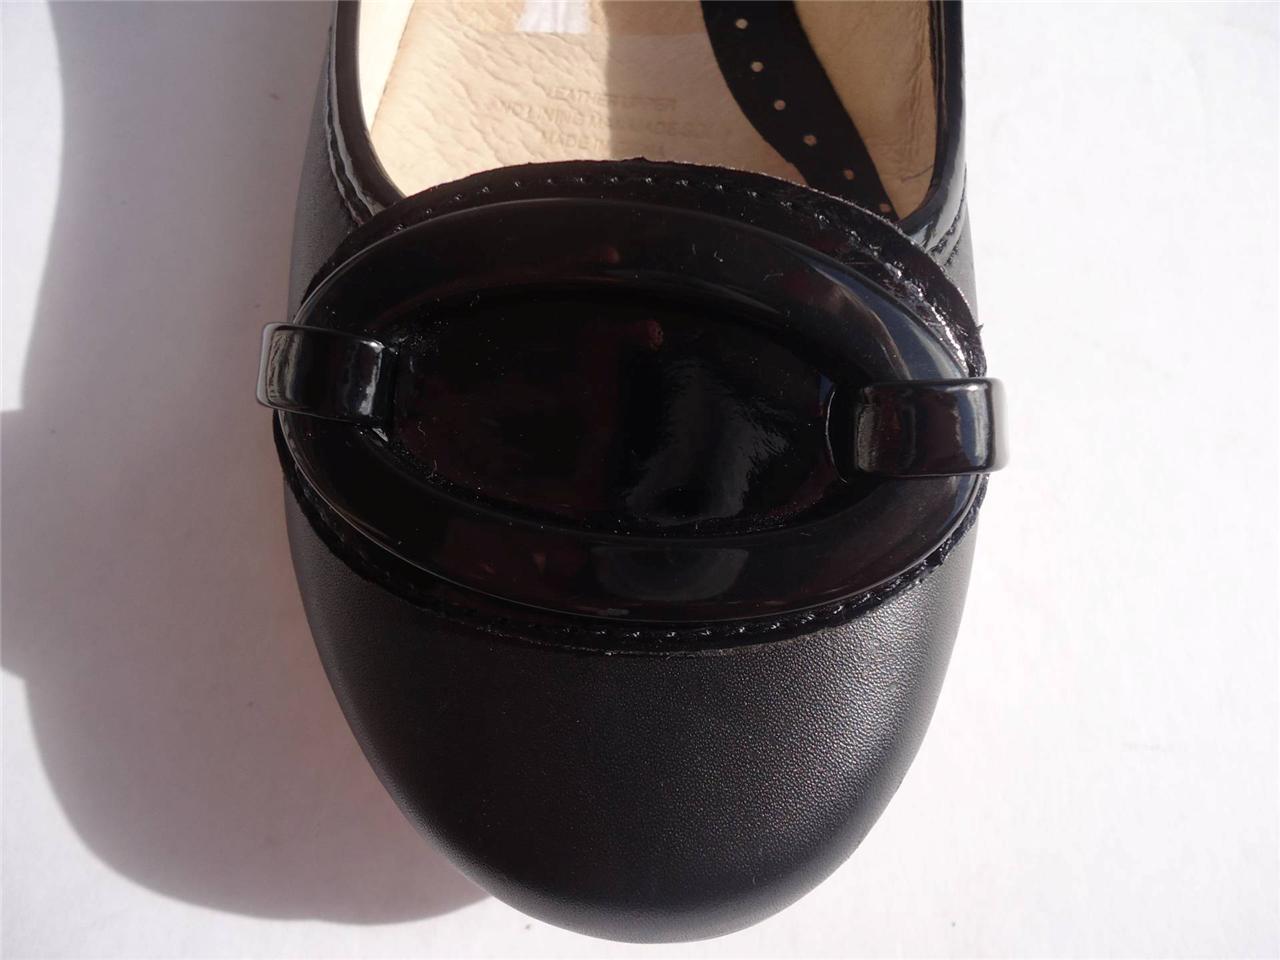 New-Women-Ladies-Diana-Ferrari-Leather-Shoe-Work-Flats-Black-Size-6-7-8-9-10-11